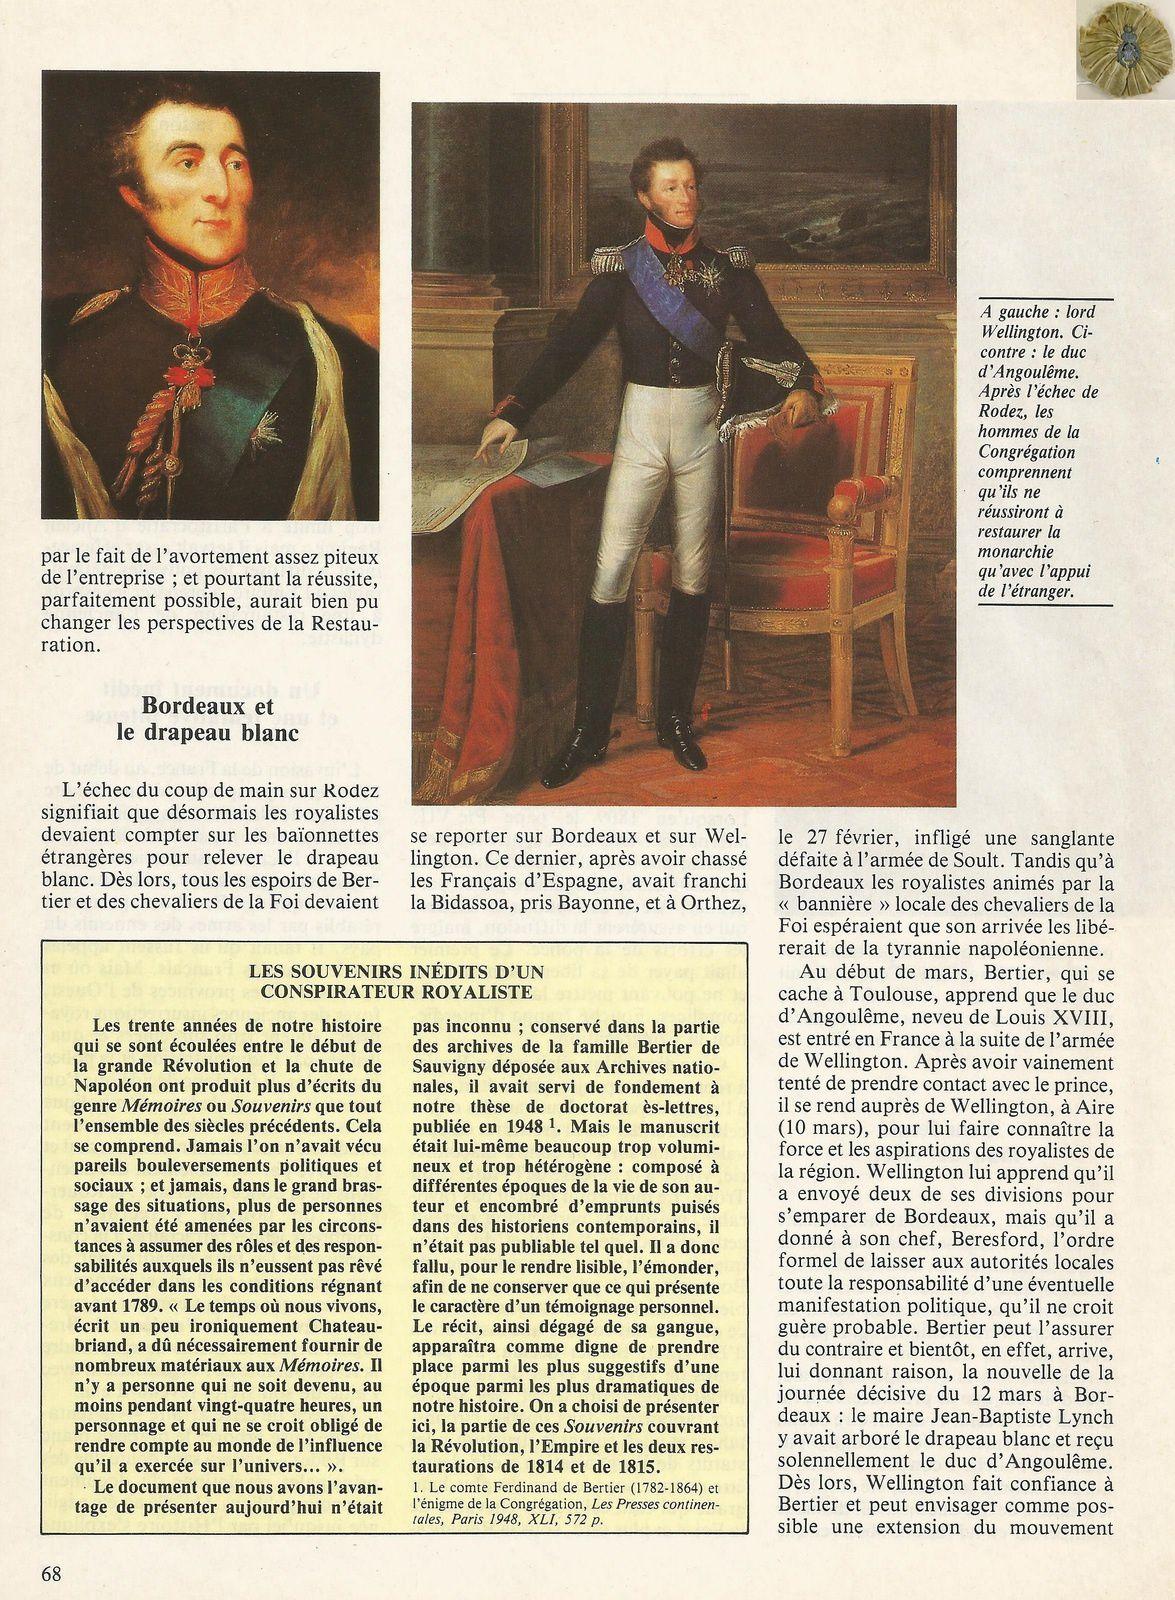 HISTORAMA NUMÉRO 72 - FÉVRIER 1990